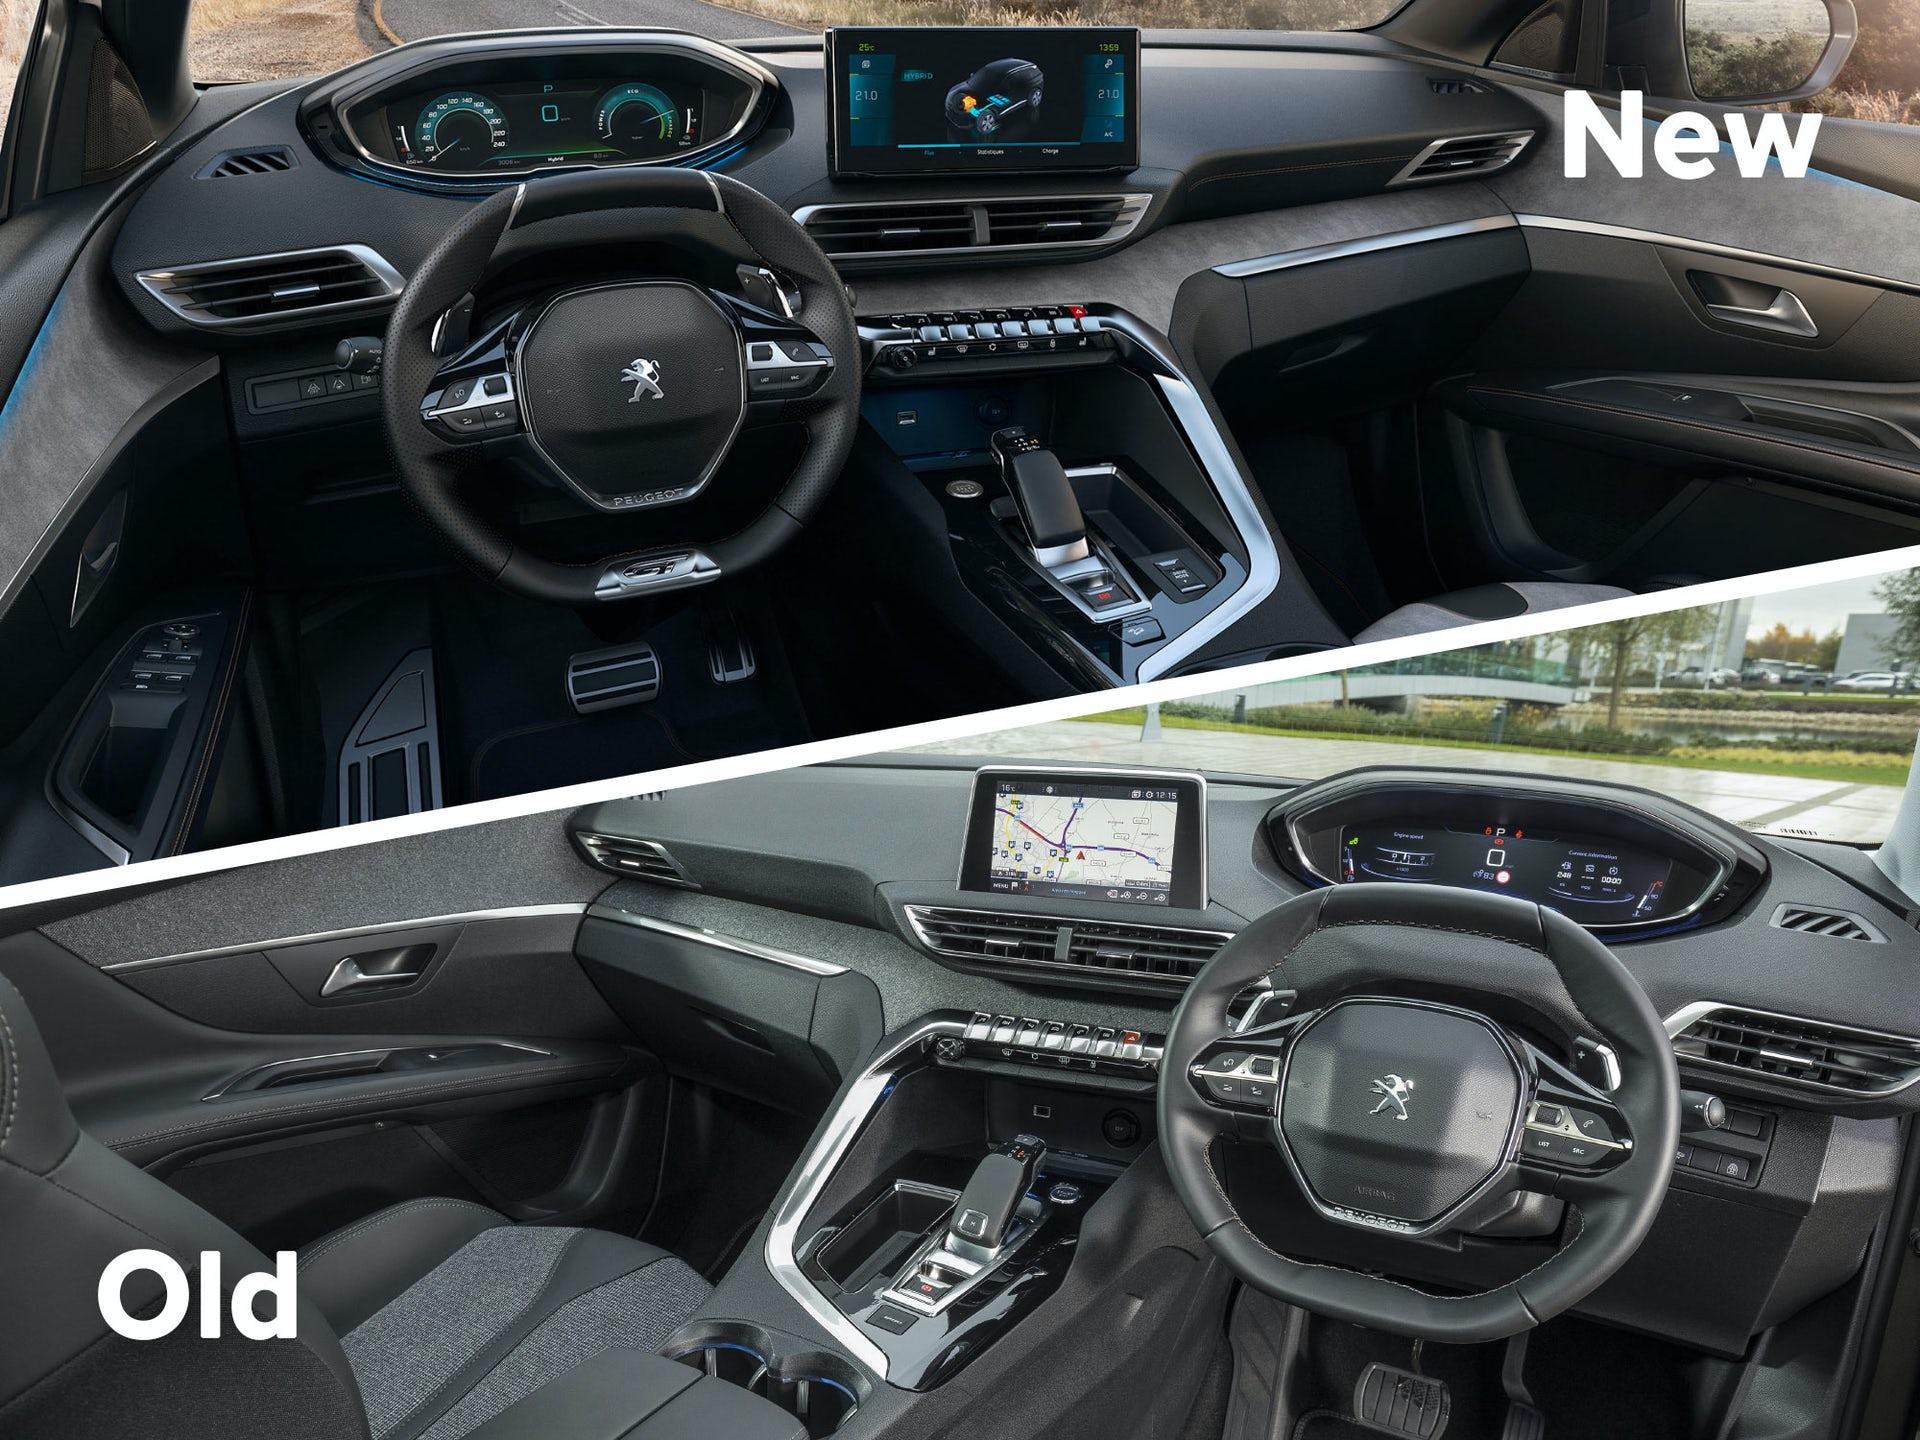 2021 Peugeot 3008 iç karşılaştırma